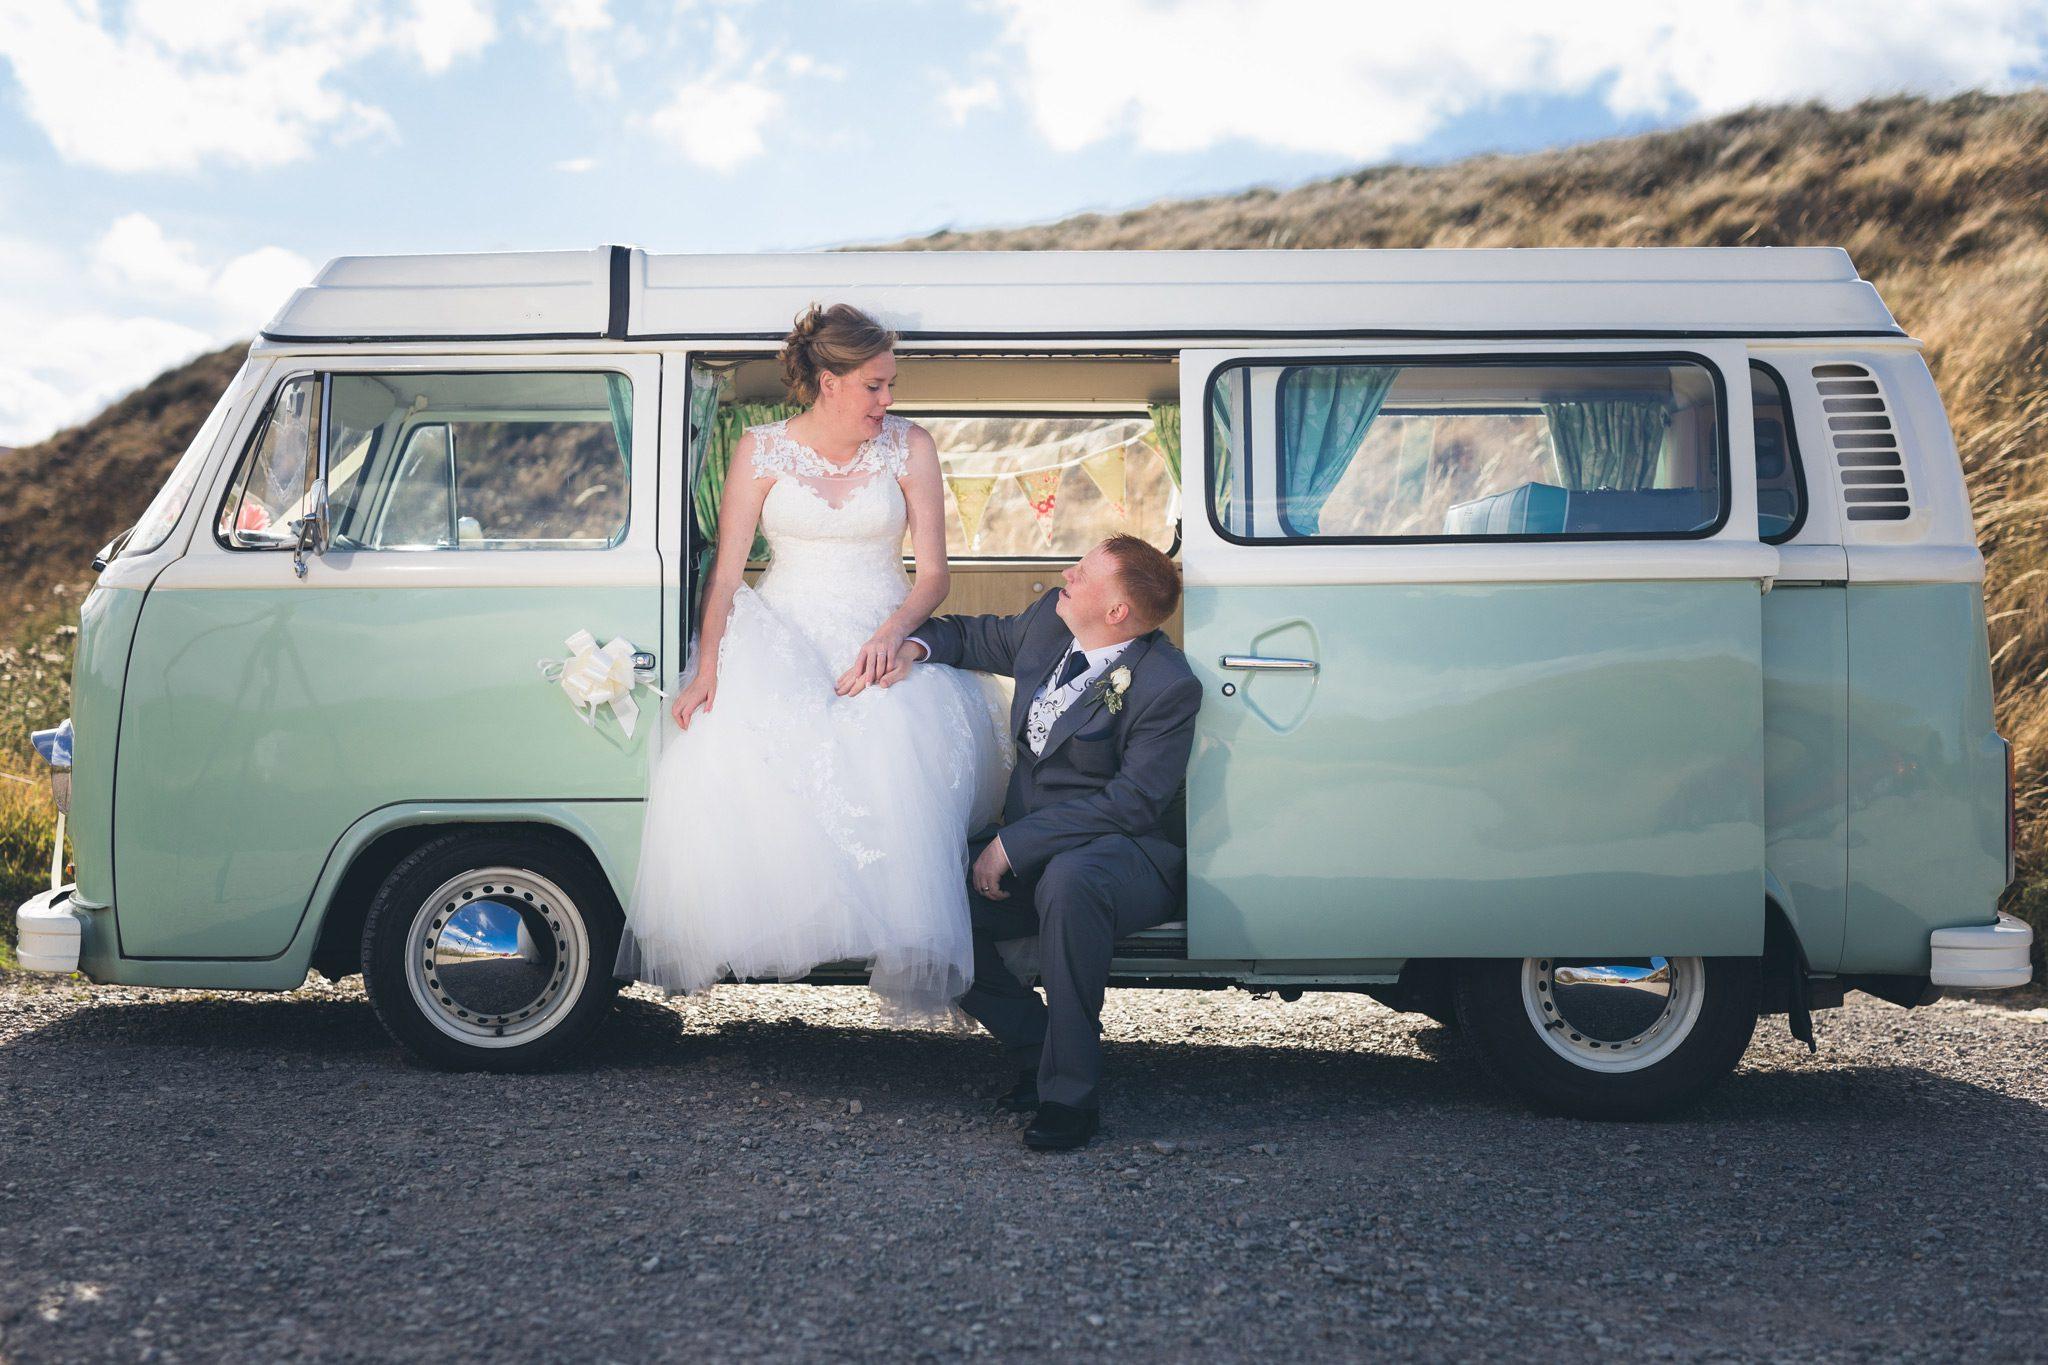 Couple at Campervan Wedding